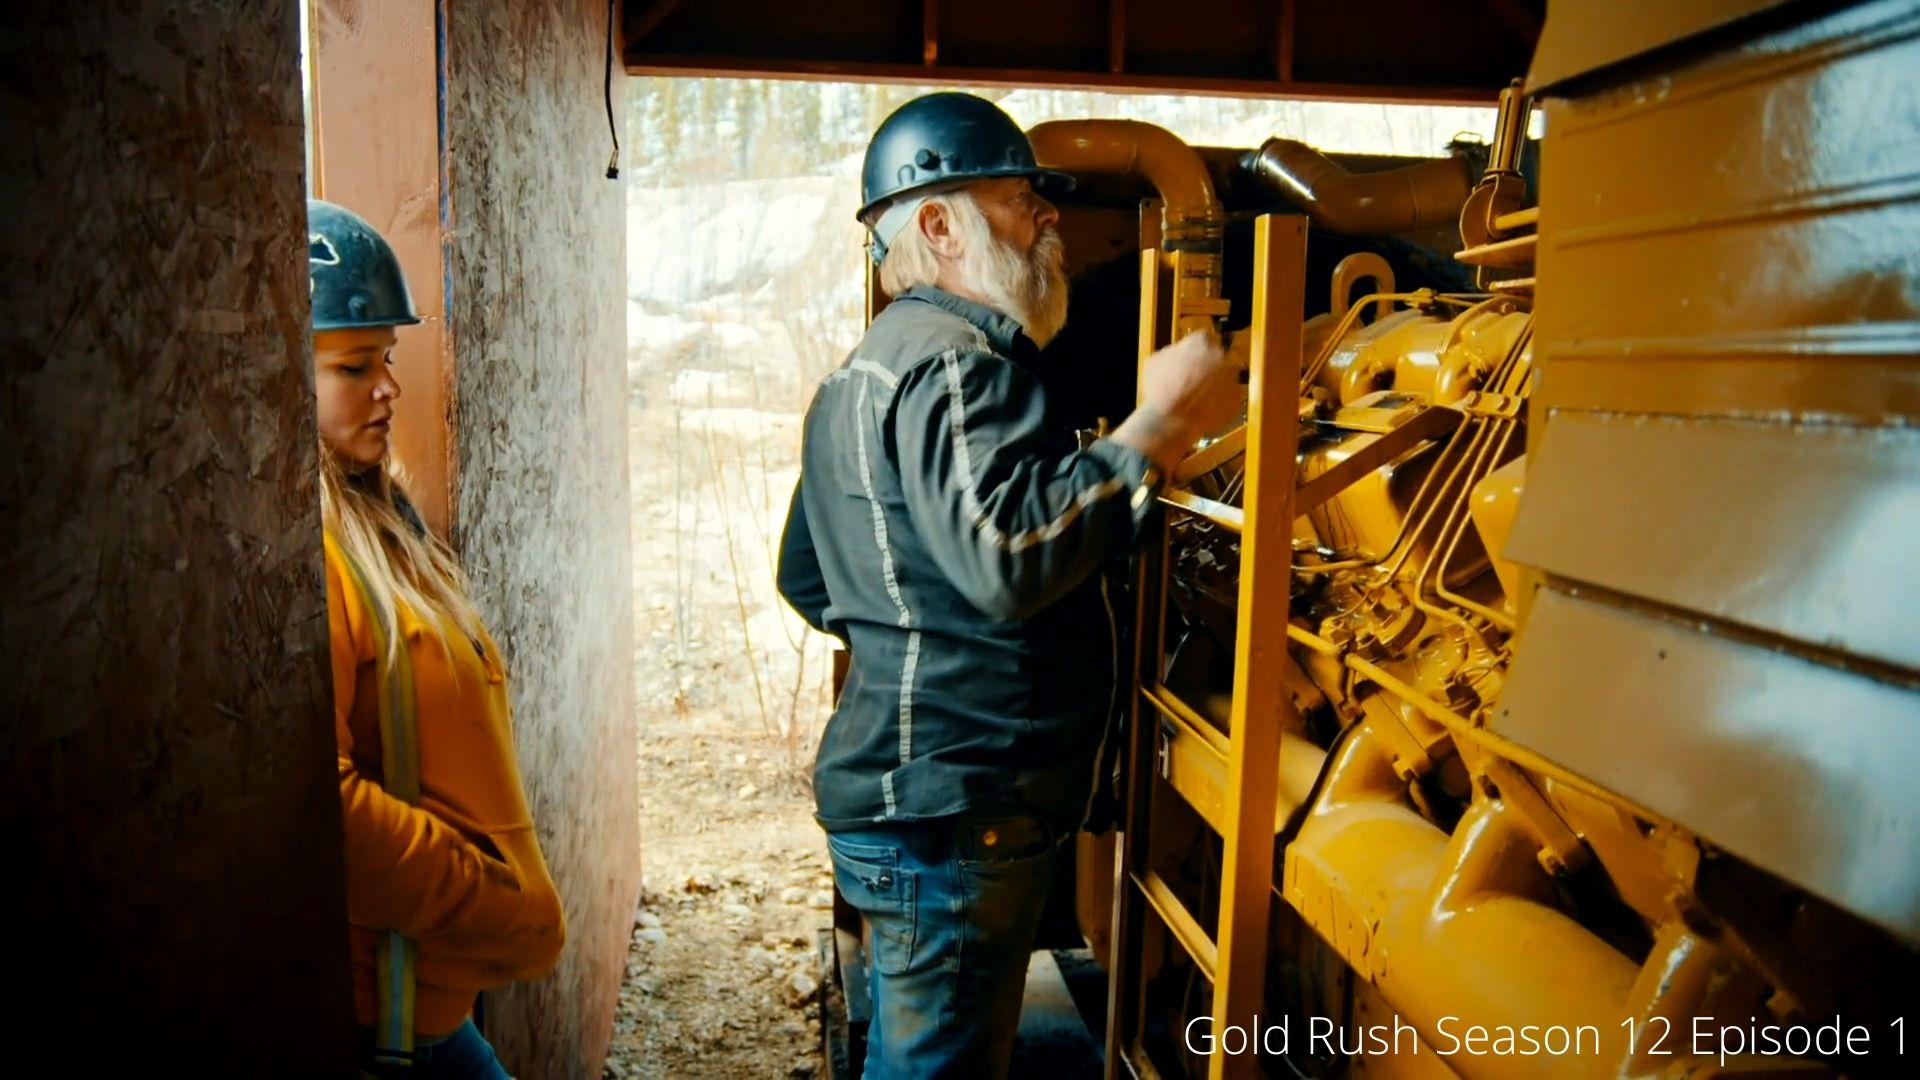 Gold Rush Season 12 Episode 2